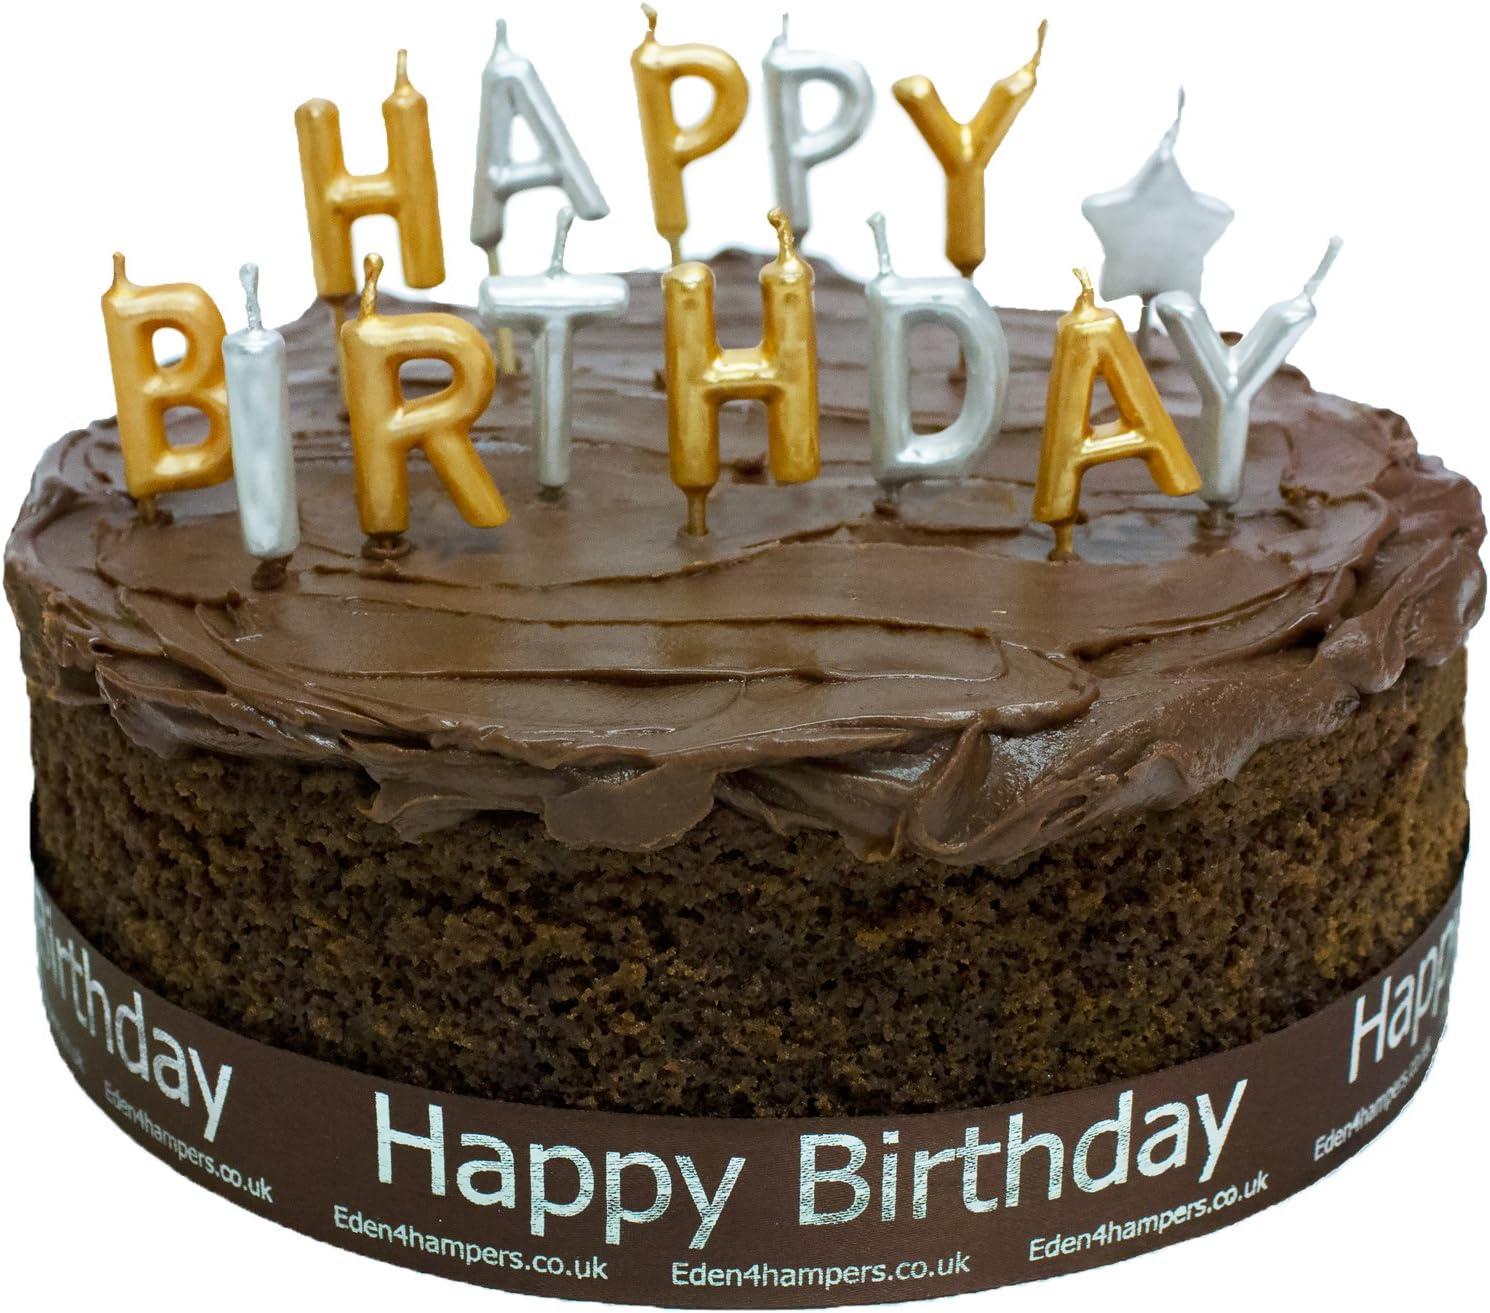 Pleasant Eden4Hampers Luxury Belgian Chocolate Birthday Cake Birthday Funny Birthday Cards Online Inifodamsfinfo